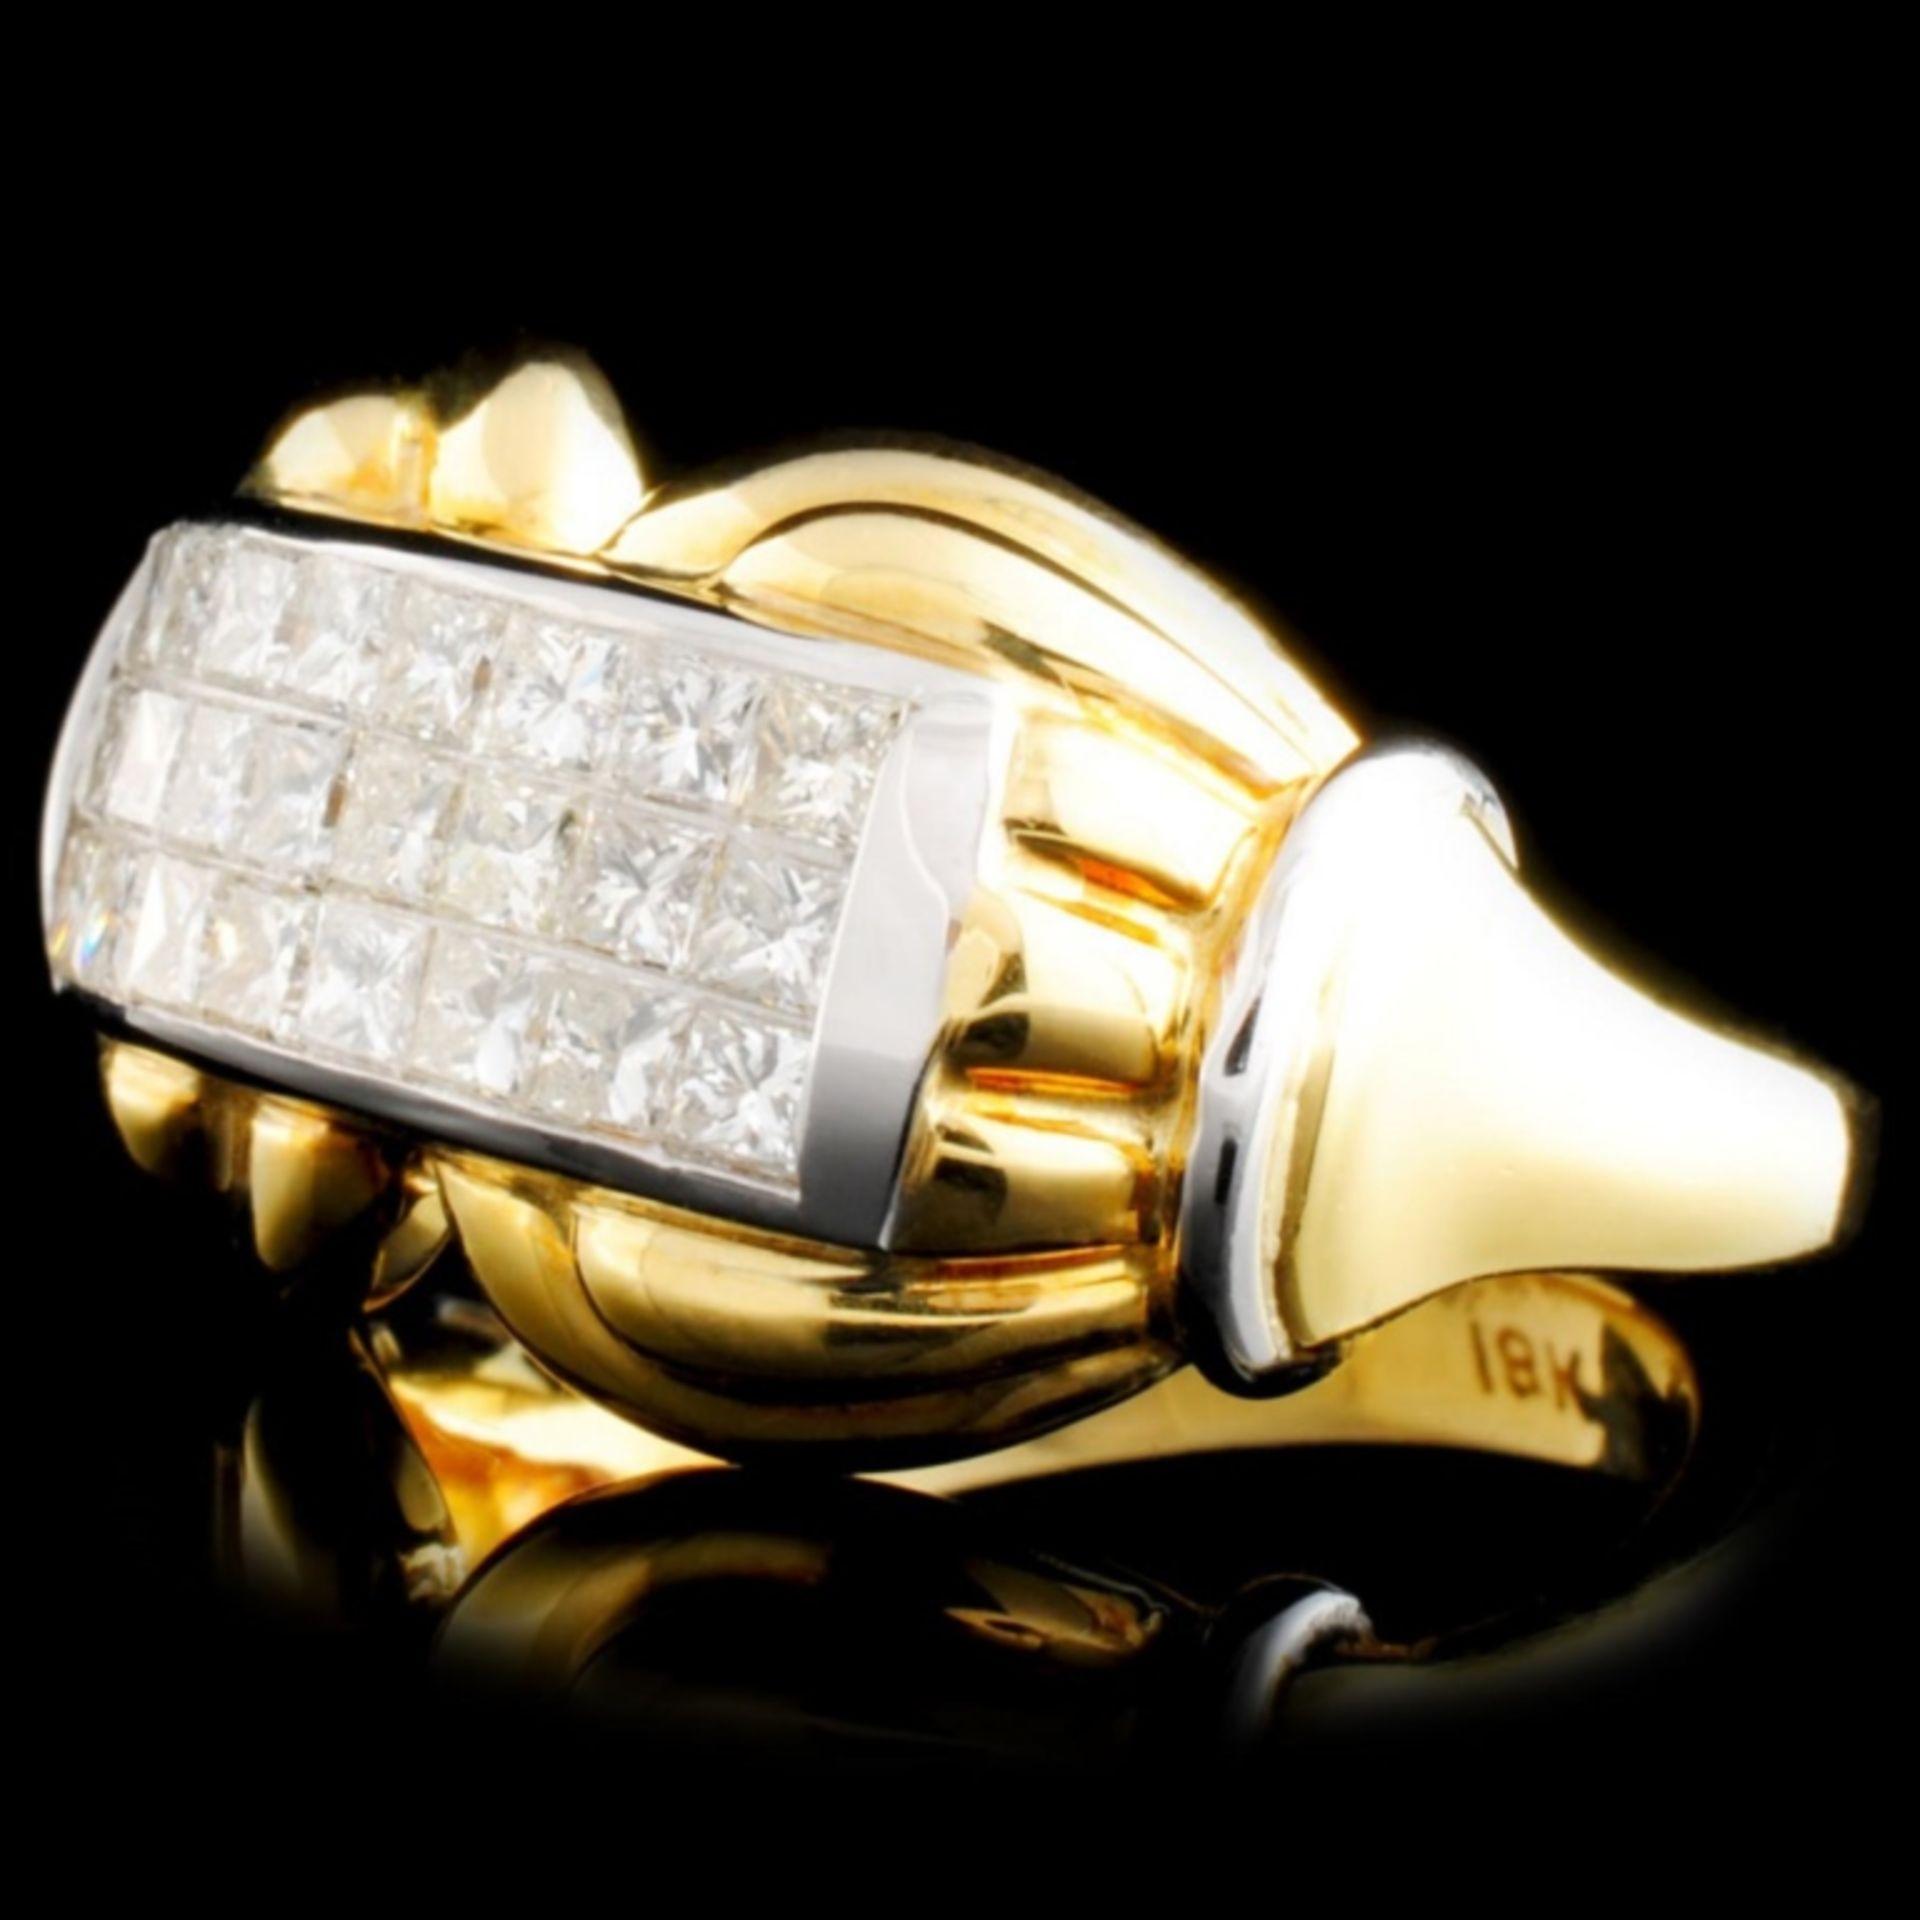 18K Gold 1.29ctw Diamond Ring - Image 2 of 4